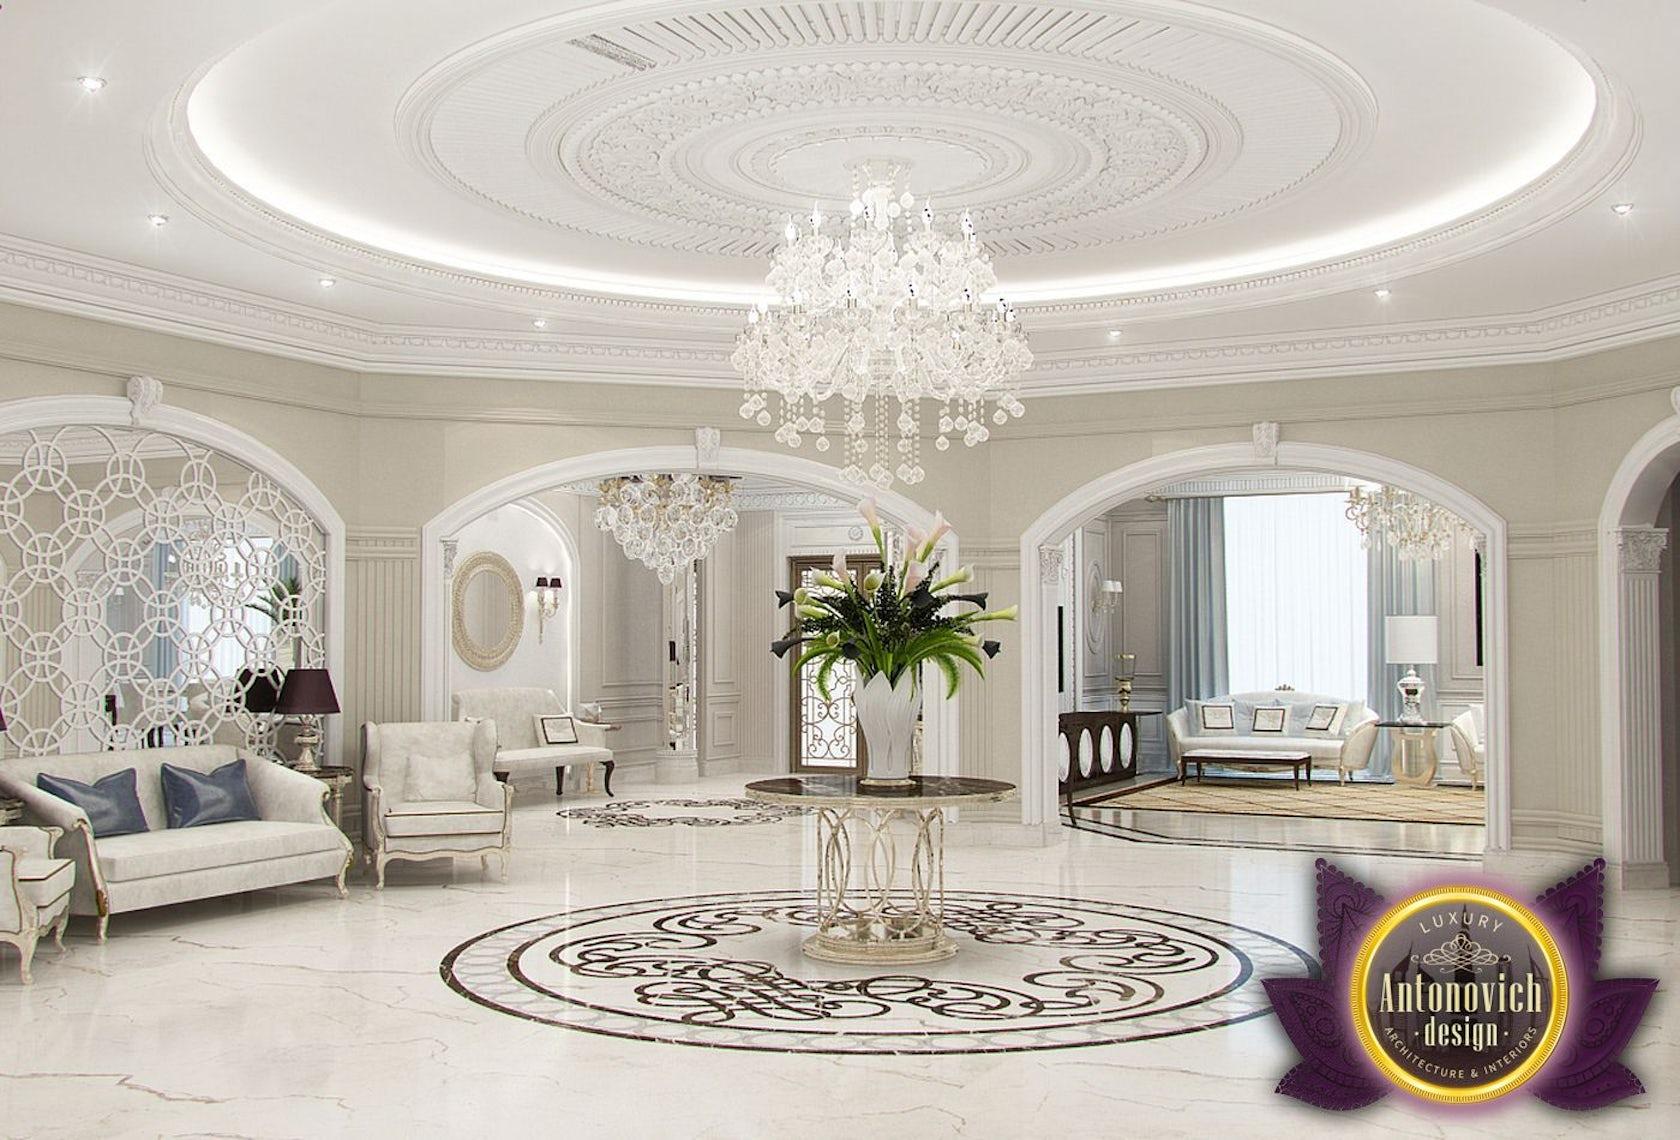 Ceilings Design Of Luxury Antonovich Design By Luxury Antonovich Design Architizer